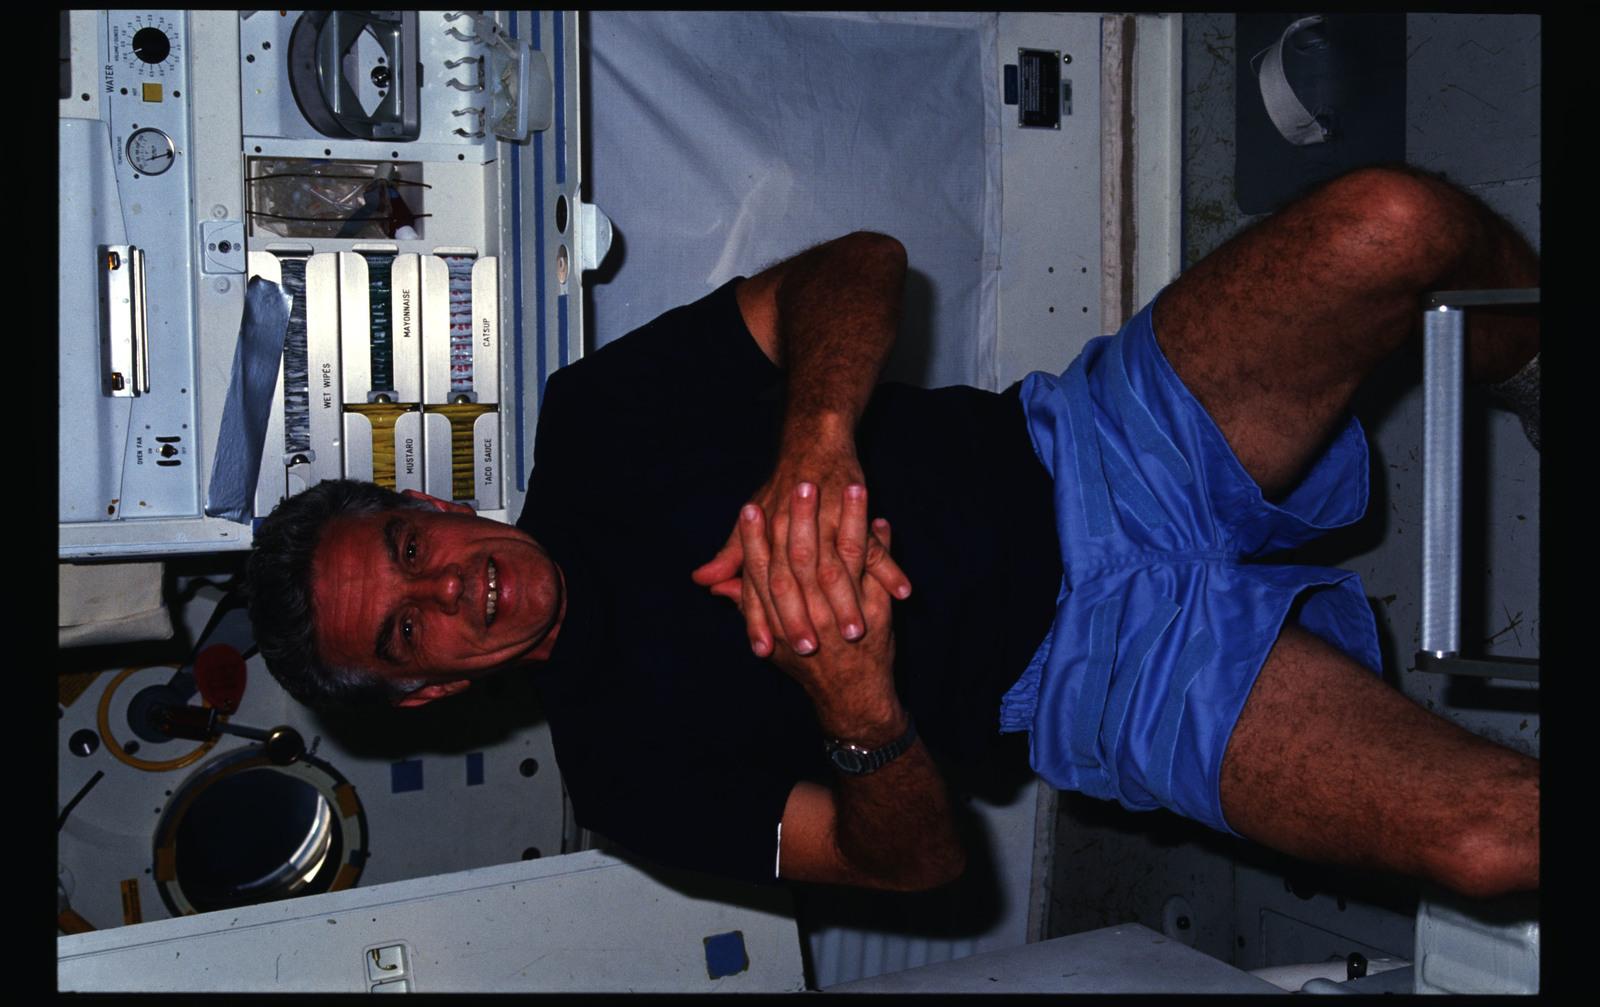 51F-04-013 - STS-51F - 51F crew activities